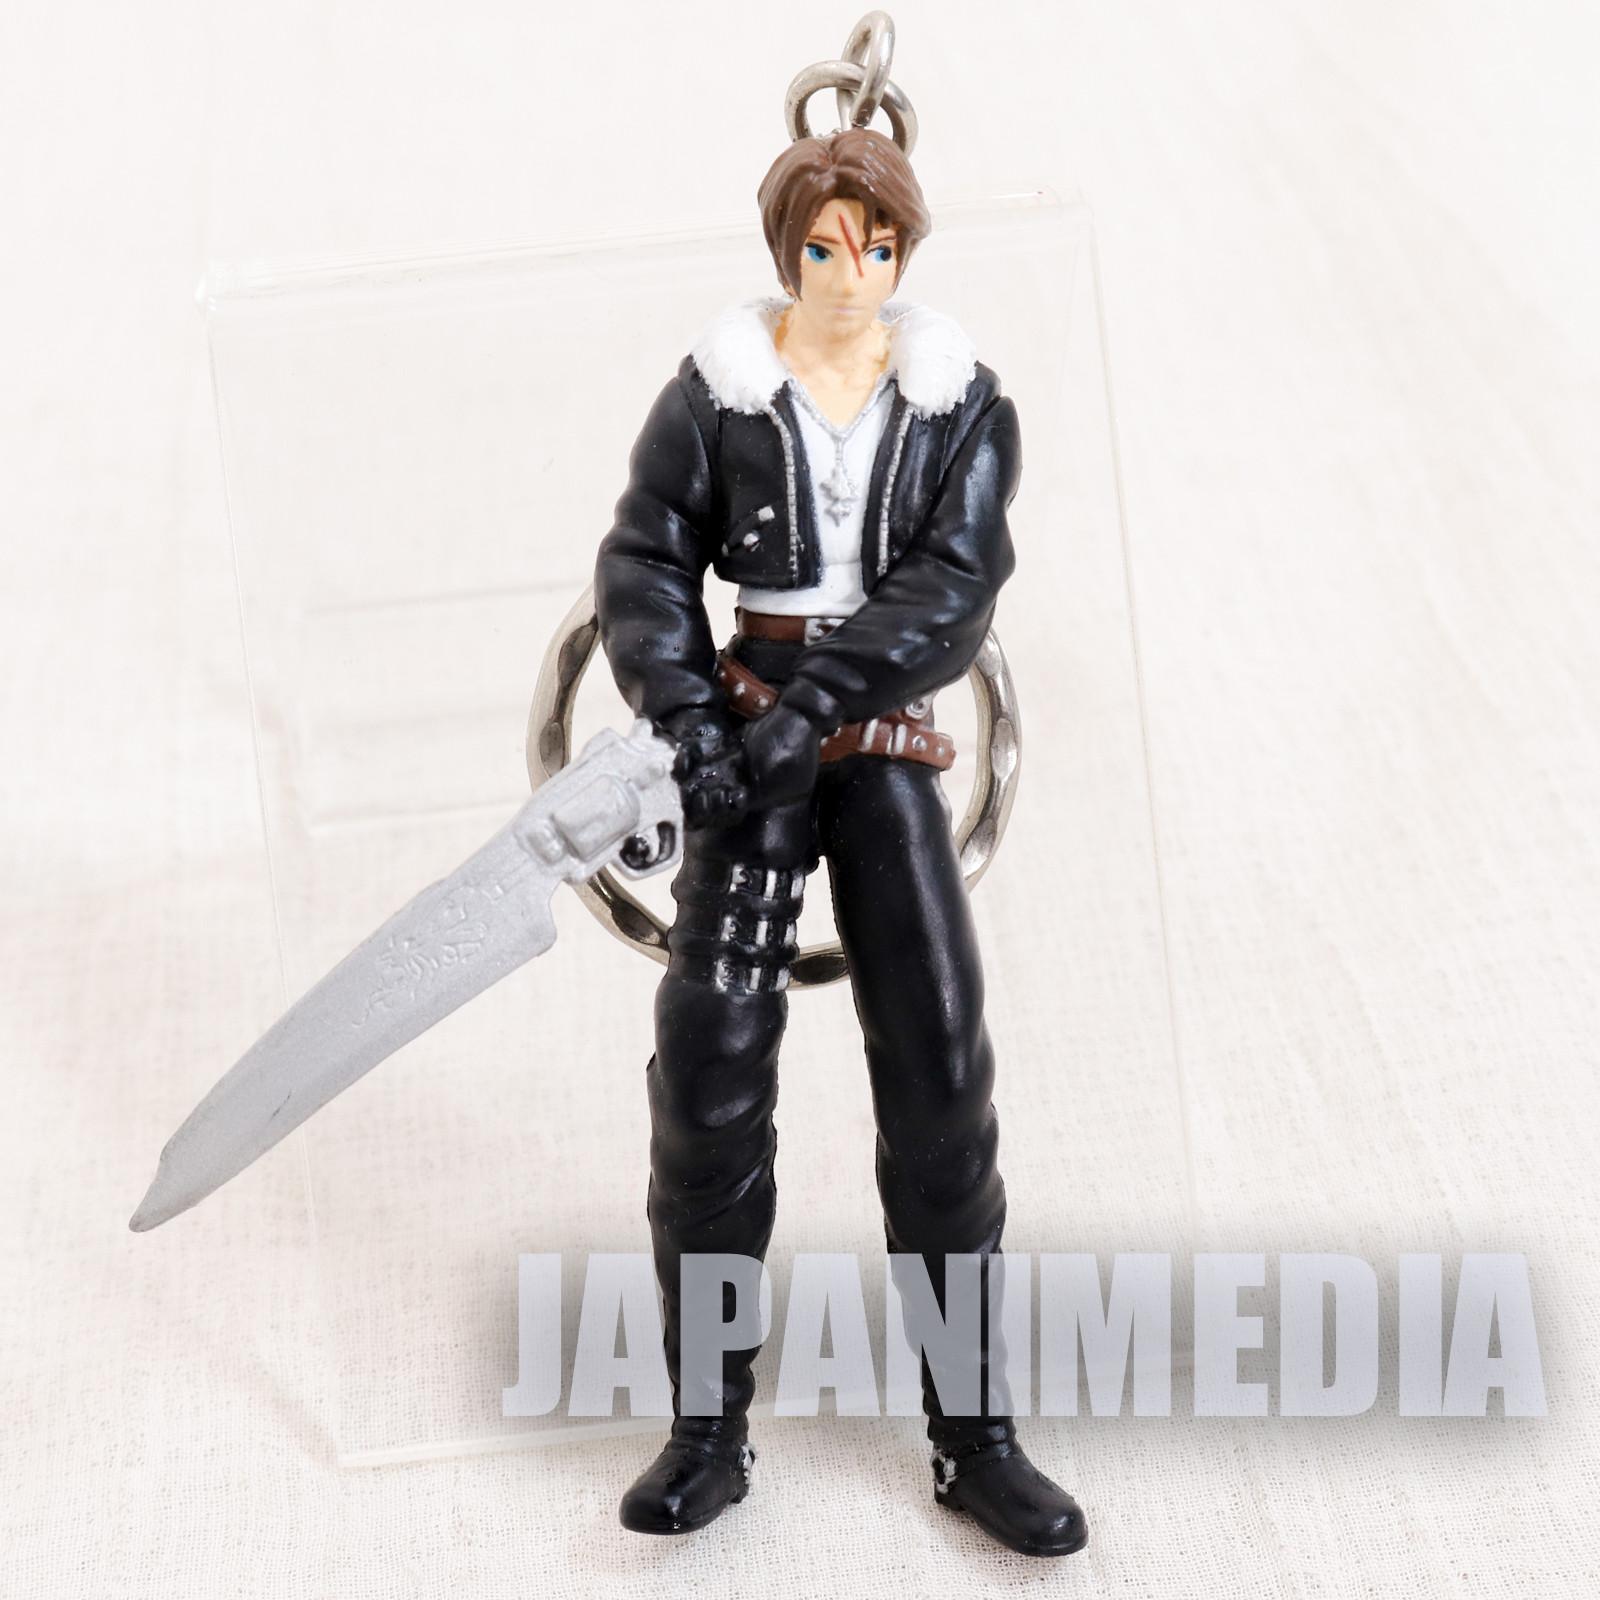 Final Fantasy VIII 8 Squall Leonhart Figure Key Chain Banpresto JAPAN SUARE ENIX